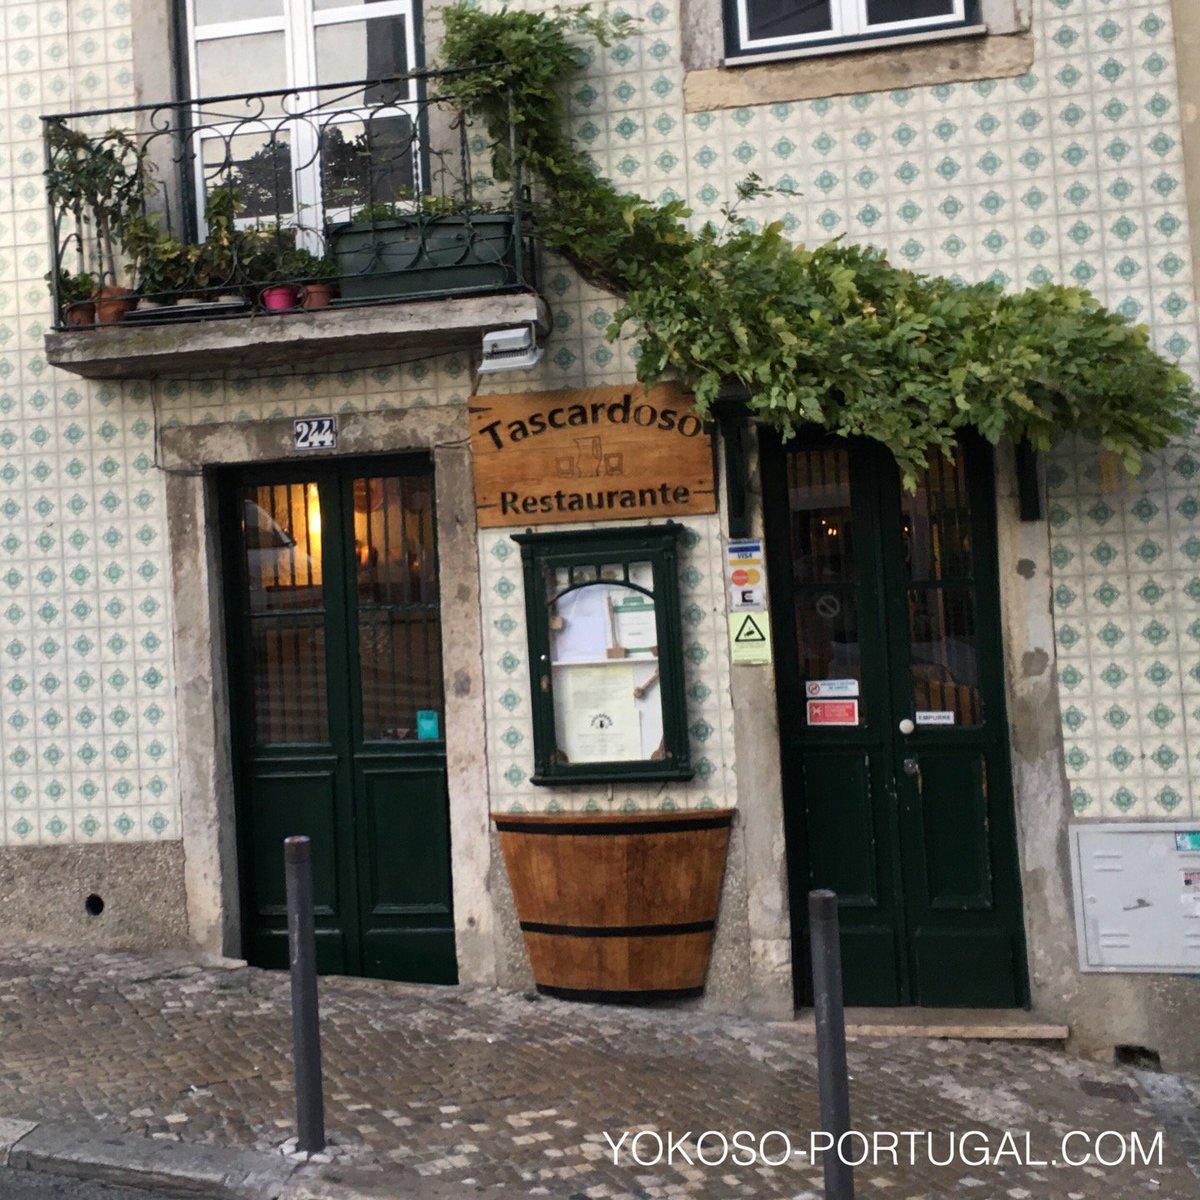 test ツイッターメディア - リスボンのプリンシペ・レアル地区にある、かわいい店構えの正統派ポルトガル料理のレストラン、タスカルドーゾ。 (@ Tascardoso) https://t.co/2E7Uou0WAI https://t.co/cZJ12kyN2W